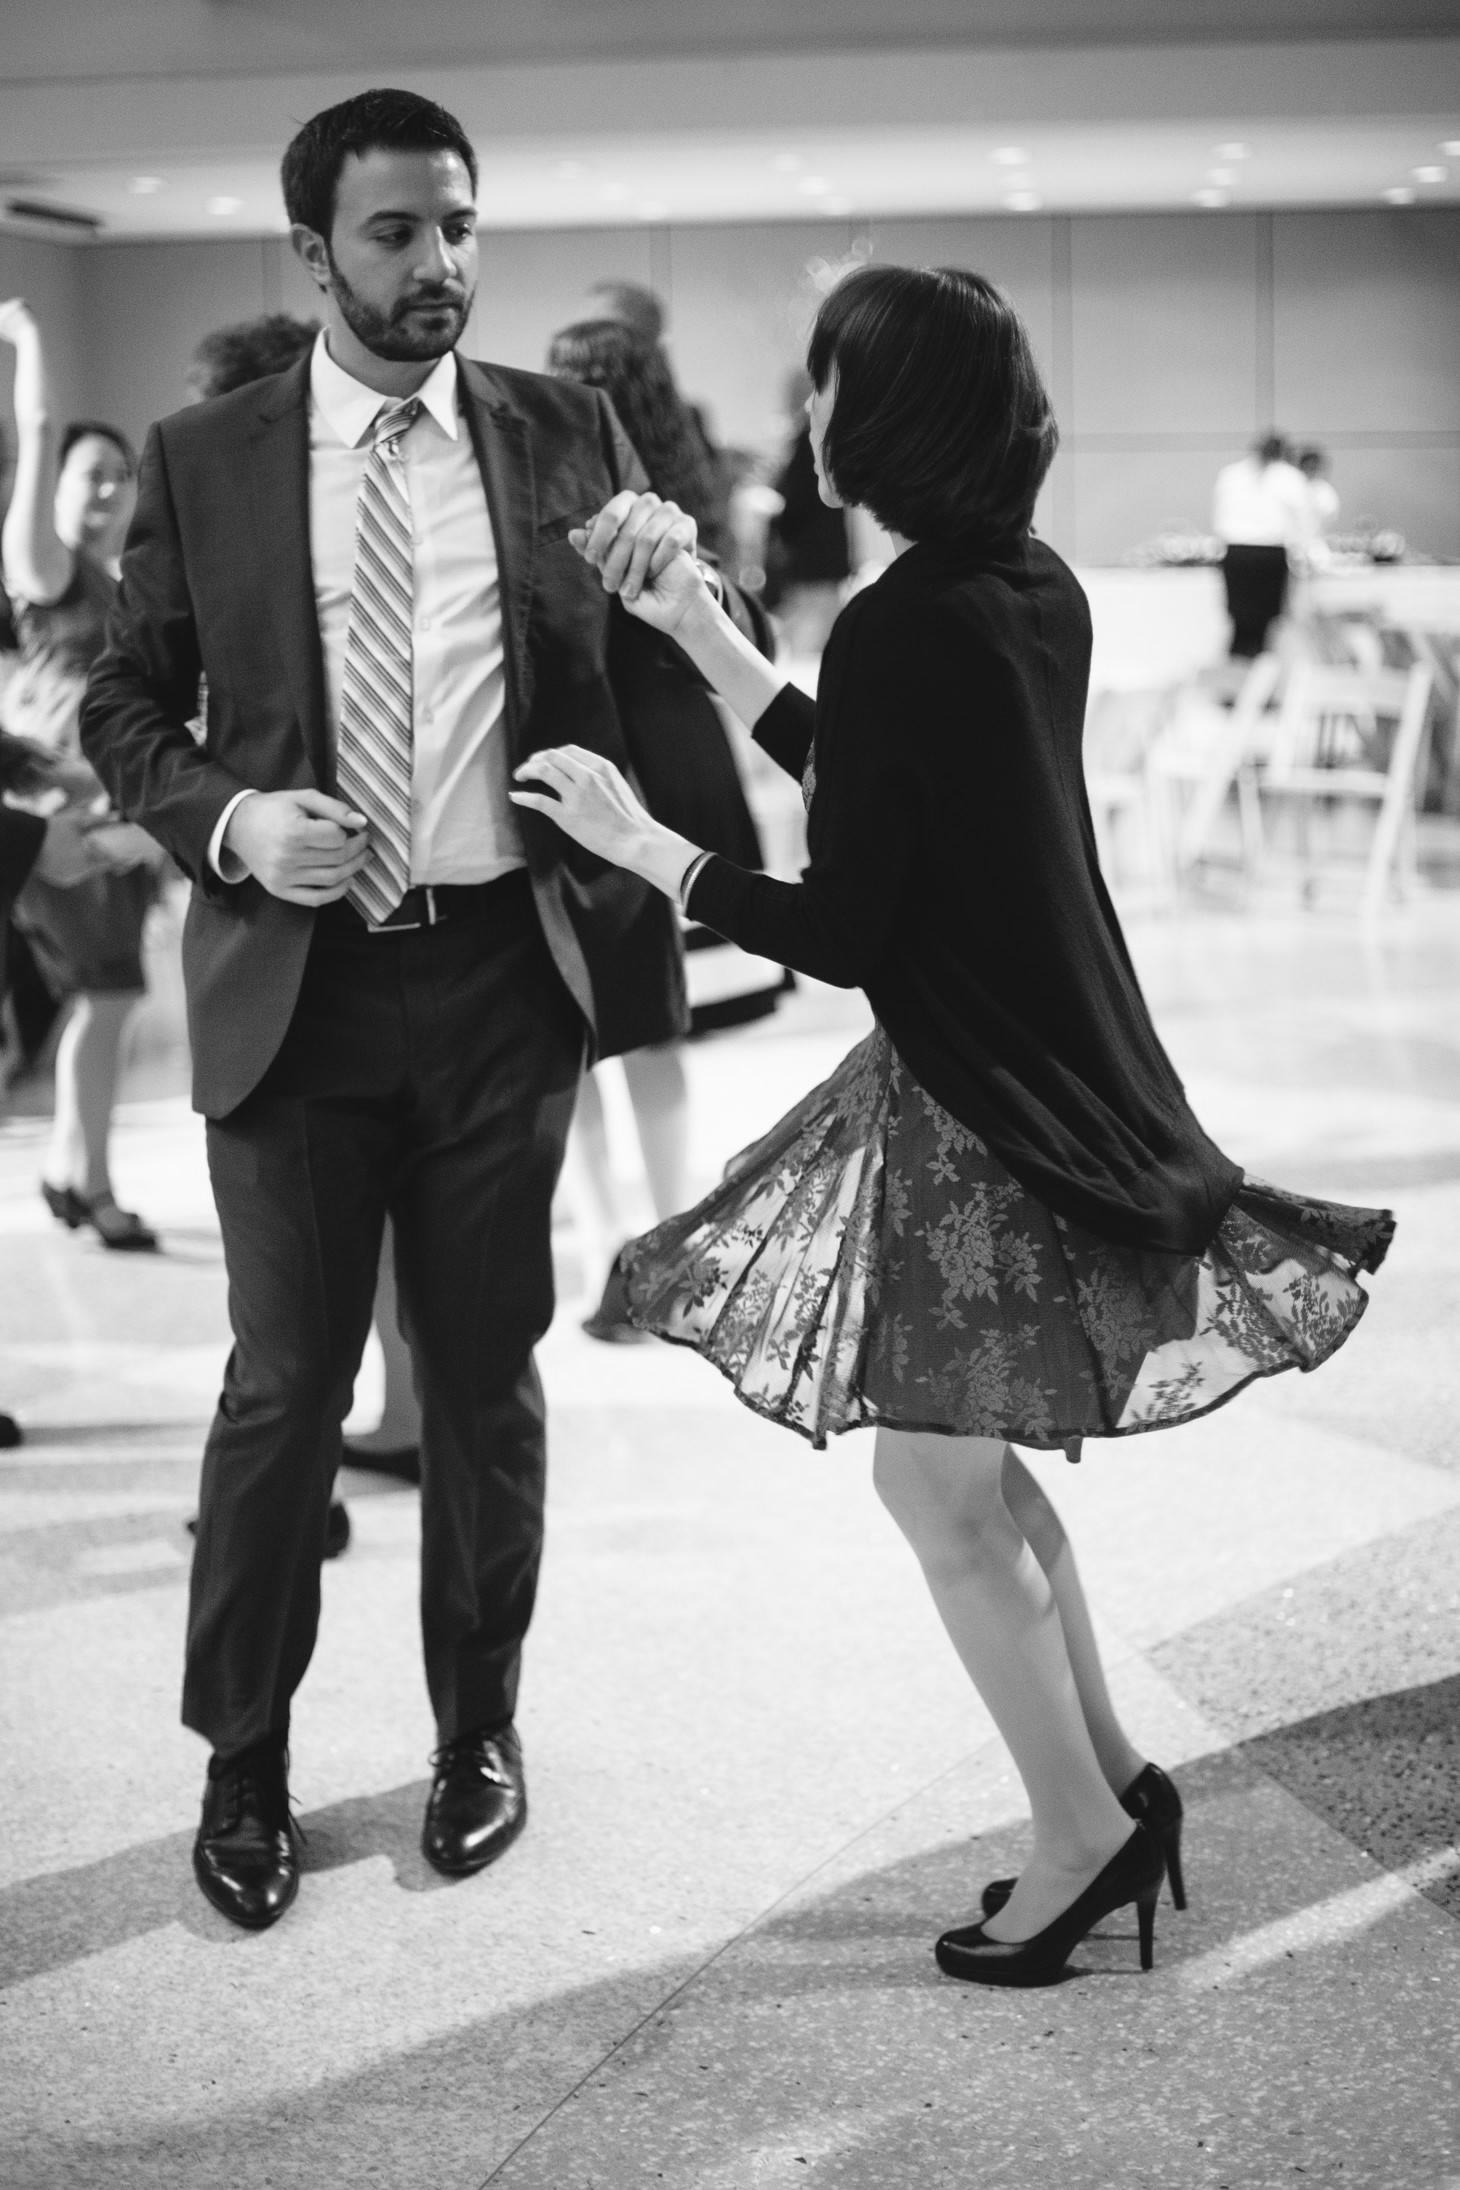 081-nyc-wedding-photographer-smitten-chickens-nj-montclair-art-museum.jpg